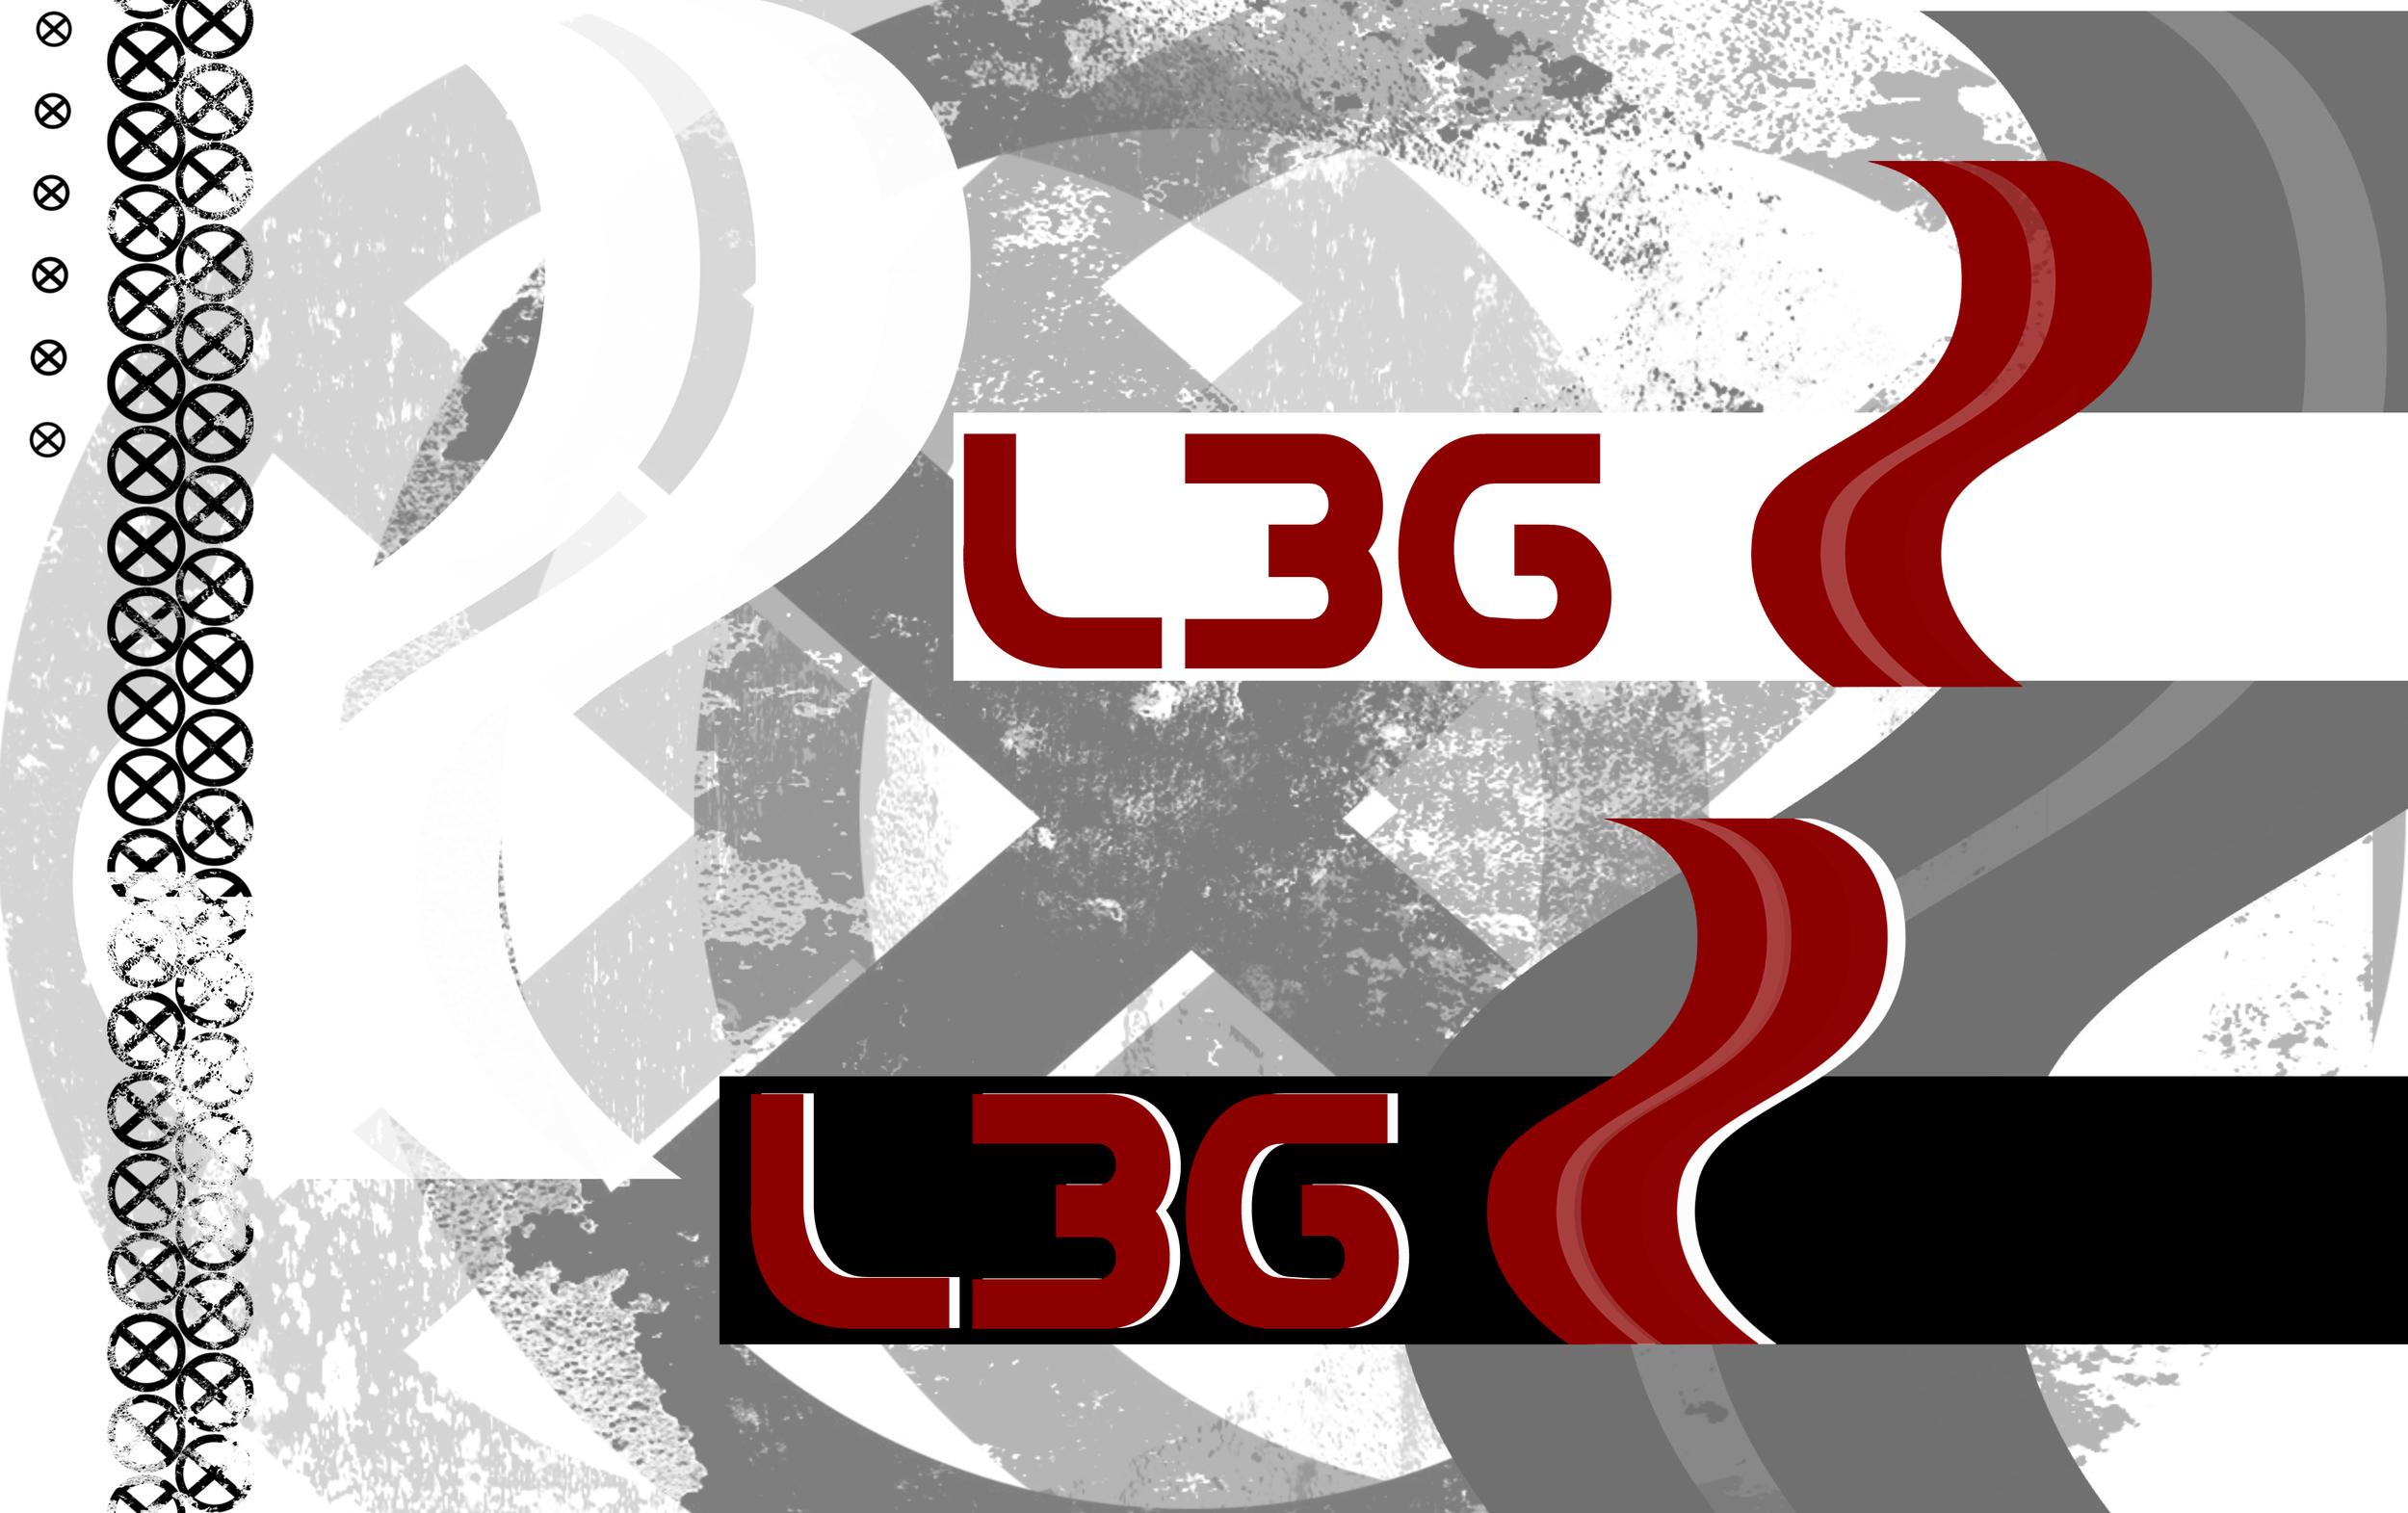 design 035 008 xline 8 l3g over.jpg